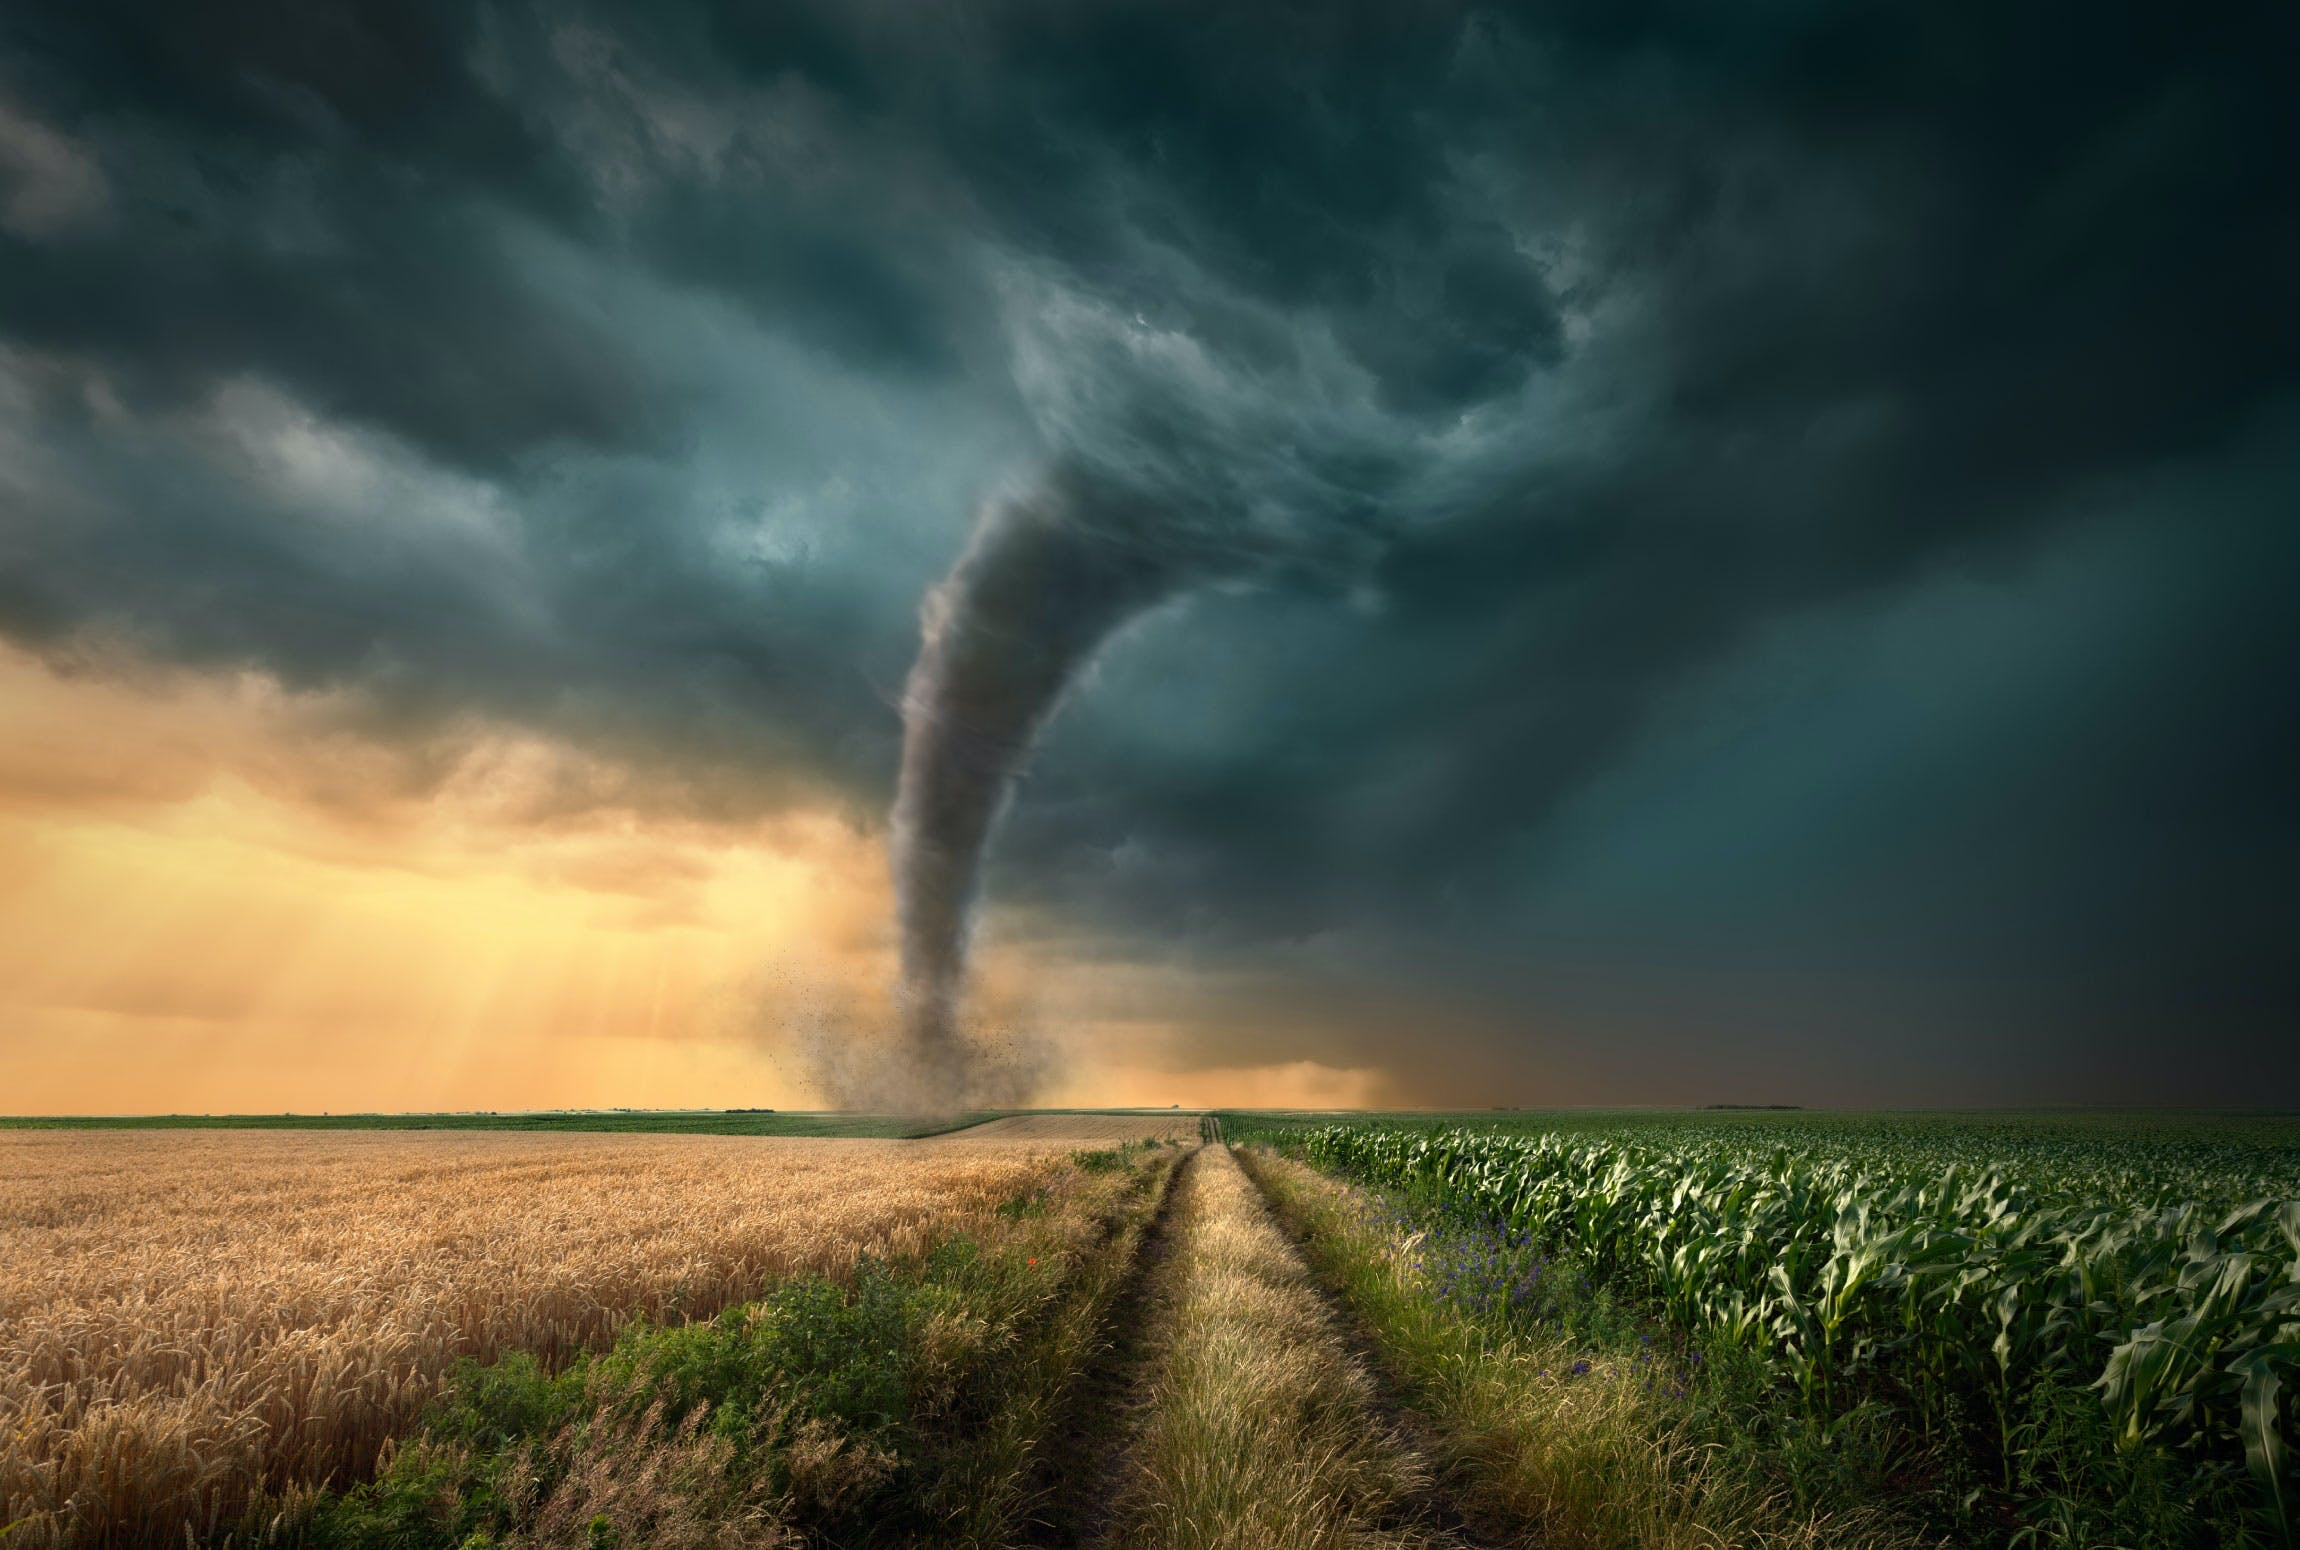 Tornado_værfenomen